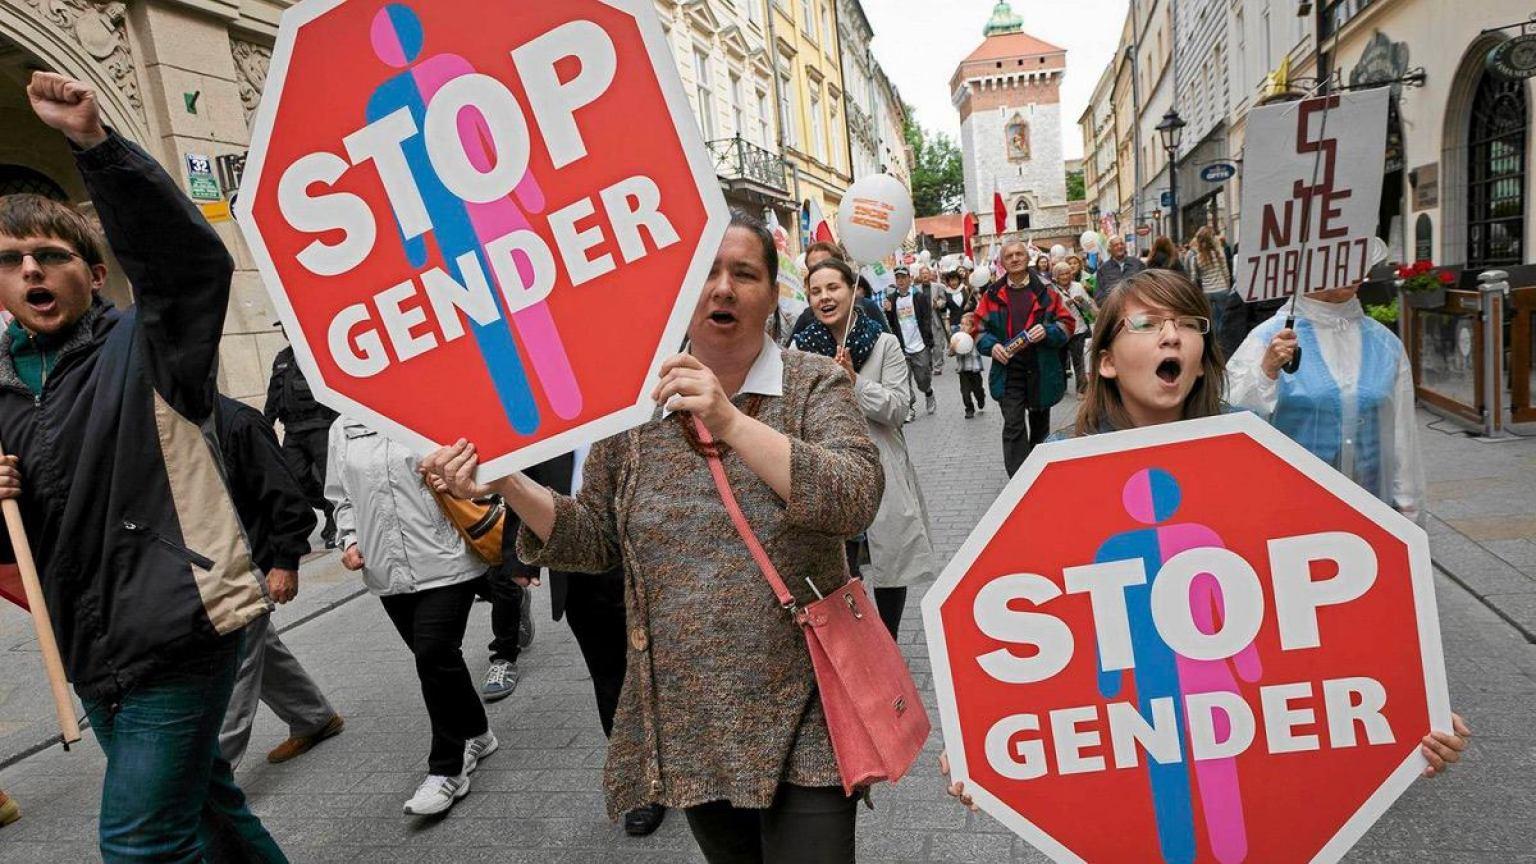 Anti-Gender protestors rally in Poland.